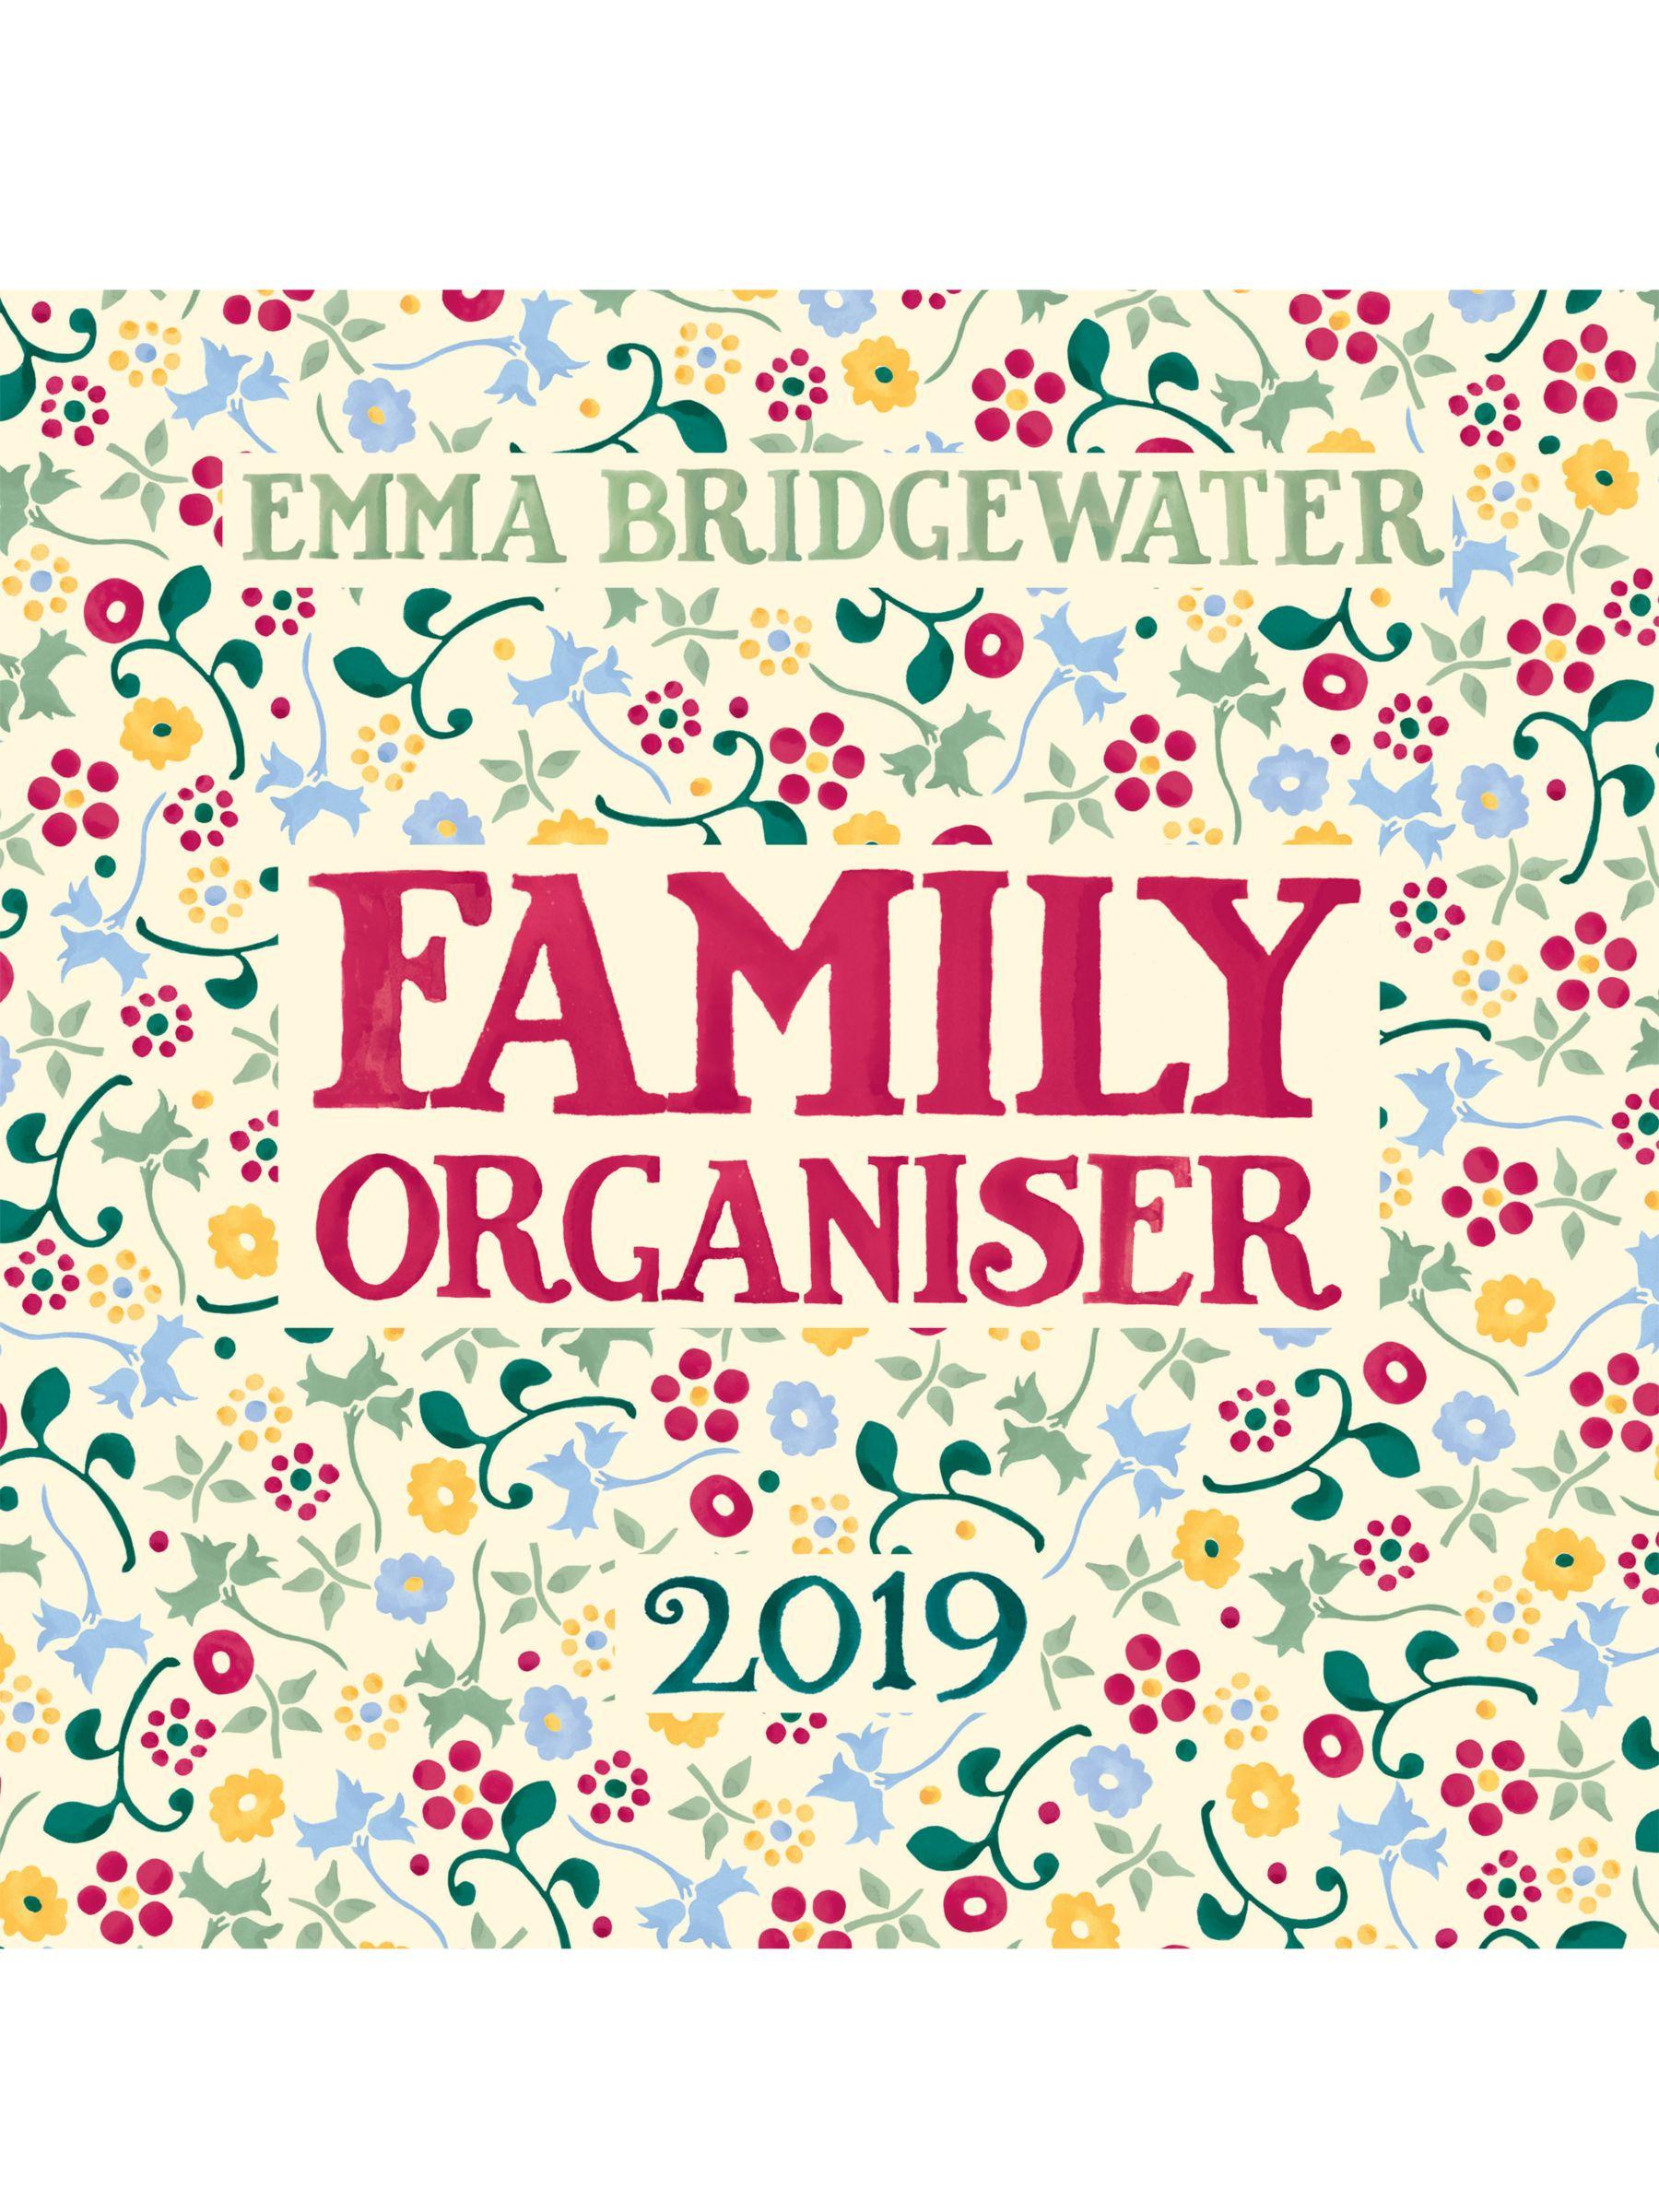 photograph regarding Family Planner Calendar identified as Emma Bridgewater 2019 Household Planner Calendar